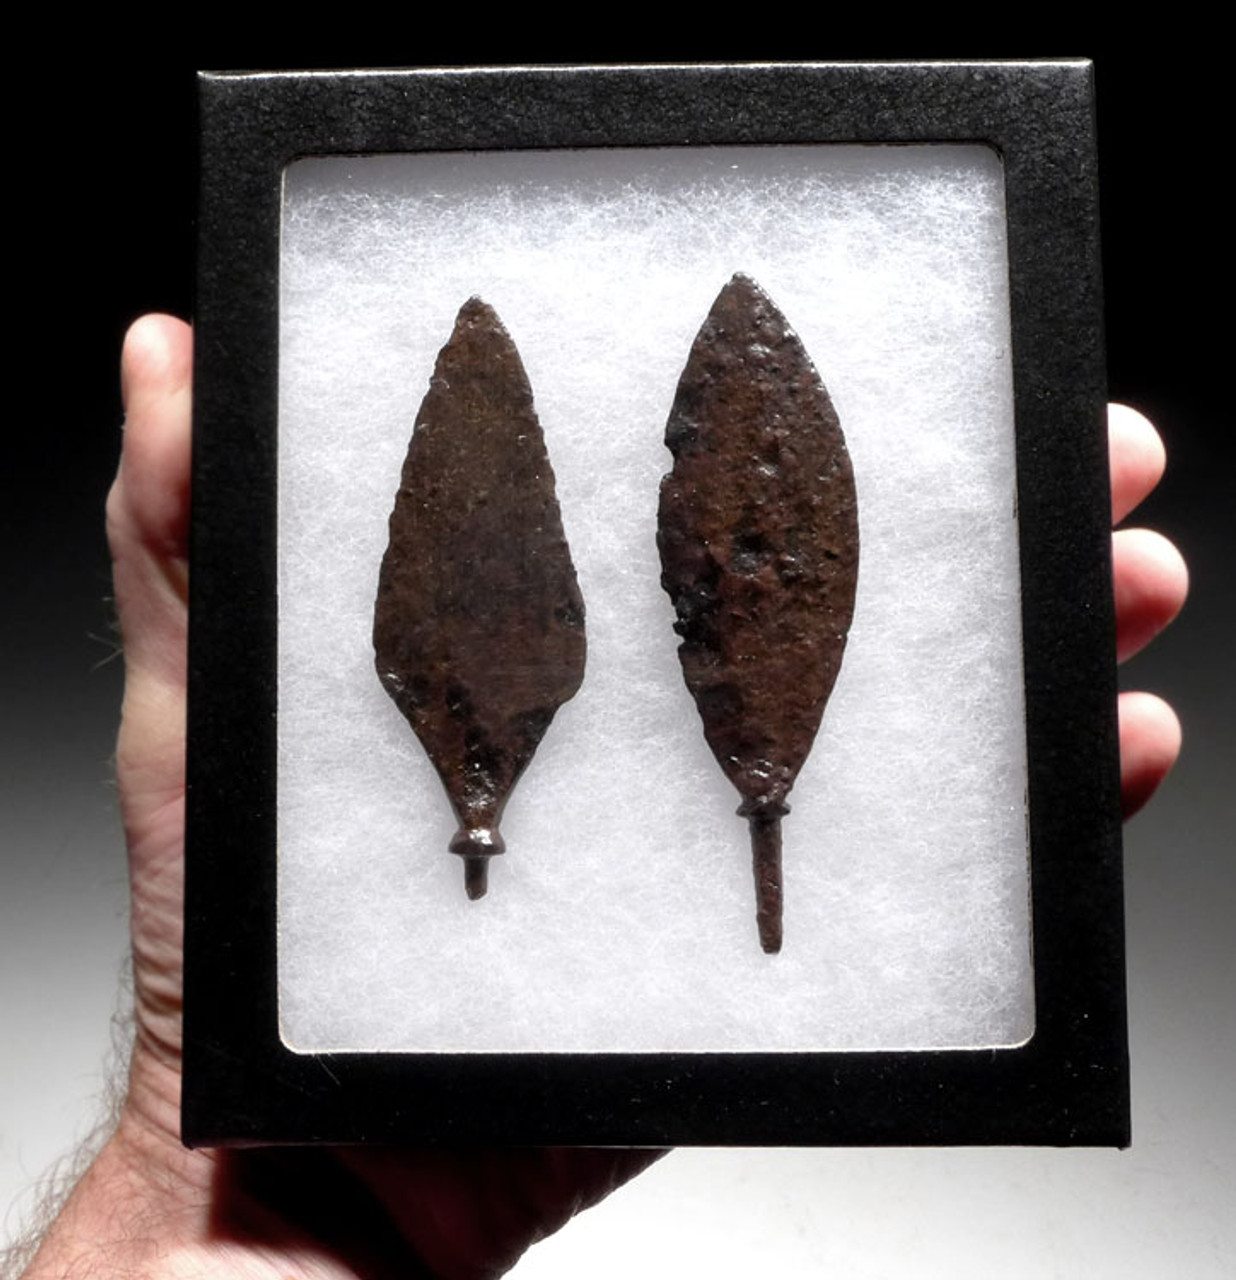 R138 - SET OF 2 LARGE ROMAN IRON ARROWHEADS FROM THE BYZANTINE ERA